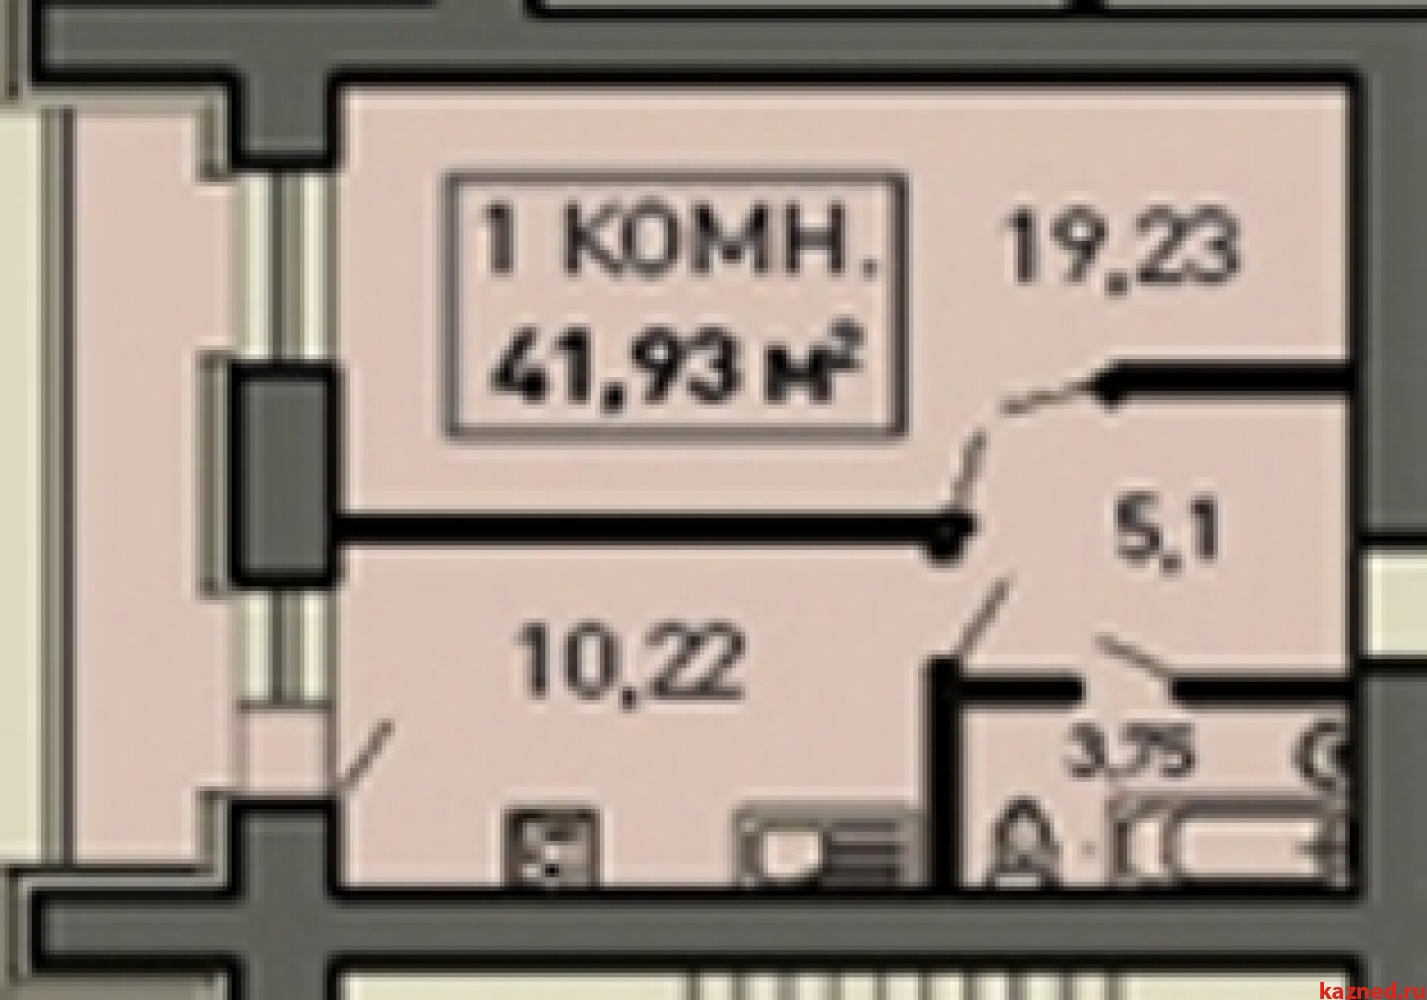 Продажа 1-к квартиры Лукина, д.52, 43 м²  (миниатюра №1)